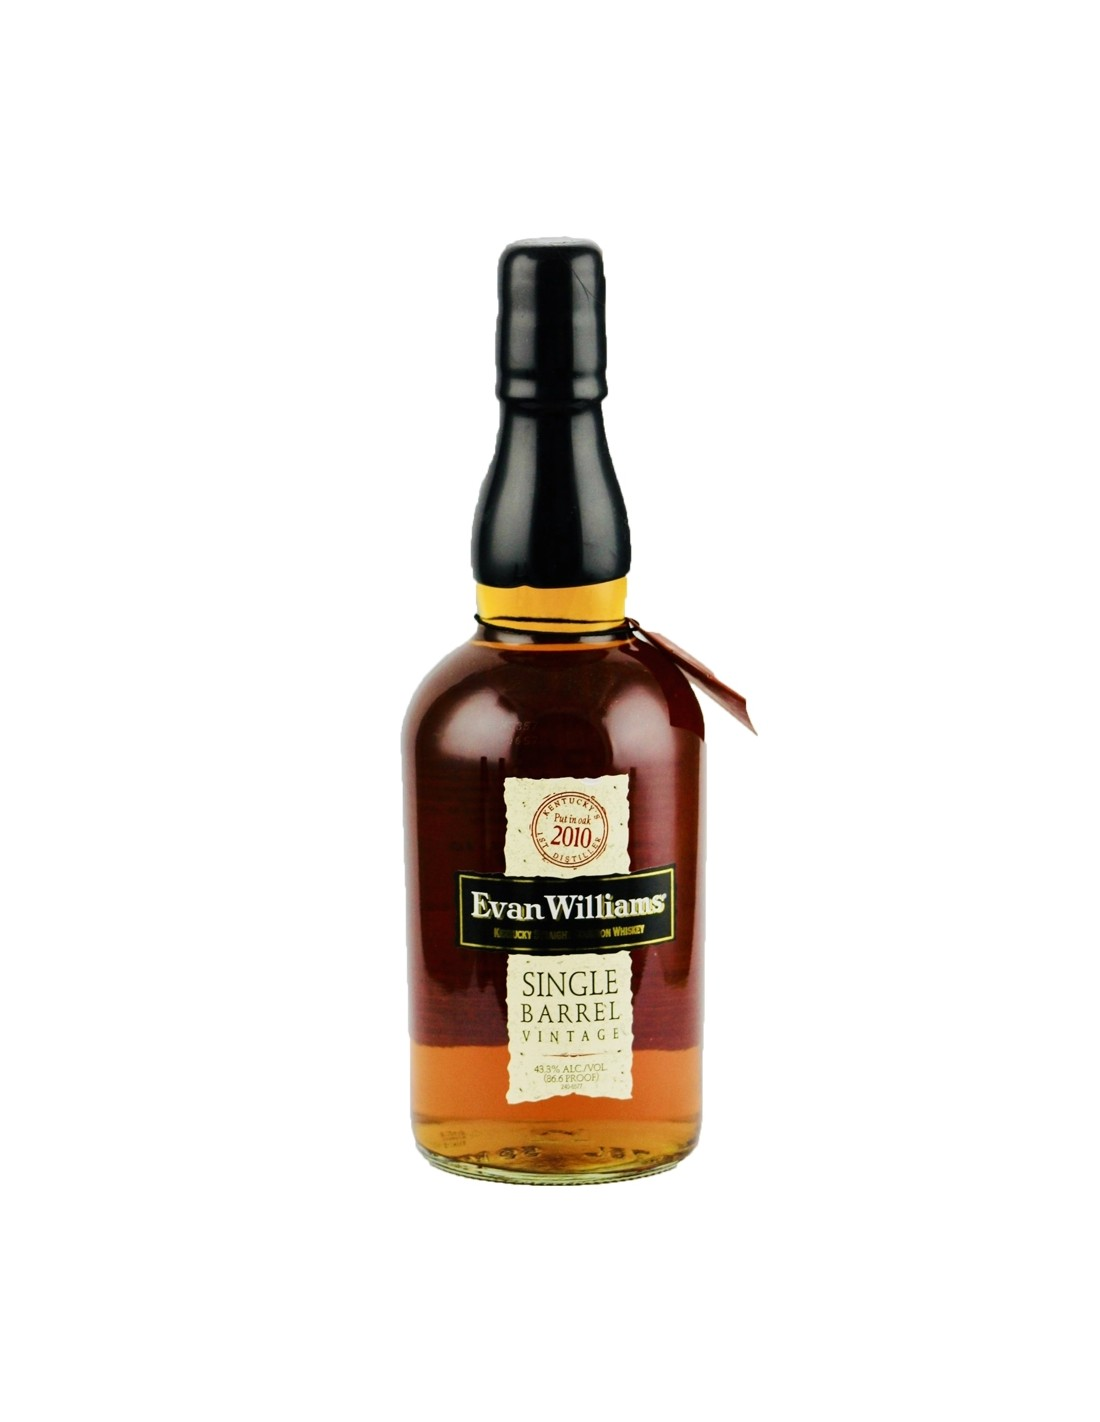 Whisky Bourbon Evan Williams Single Barrel Vintage, 43.3% alc., 0.7L